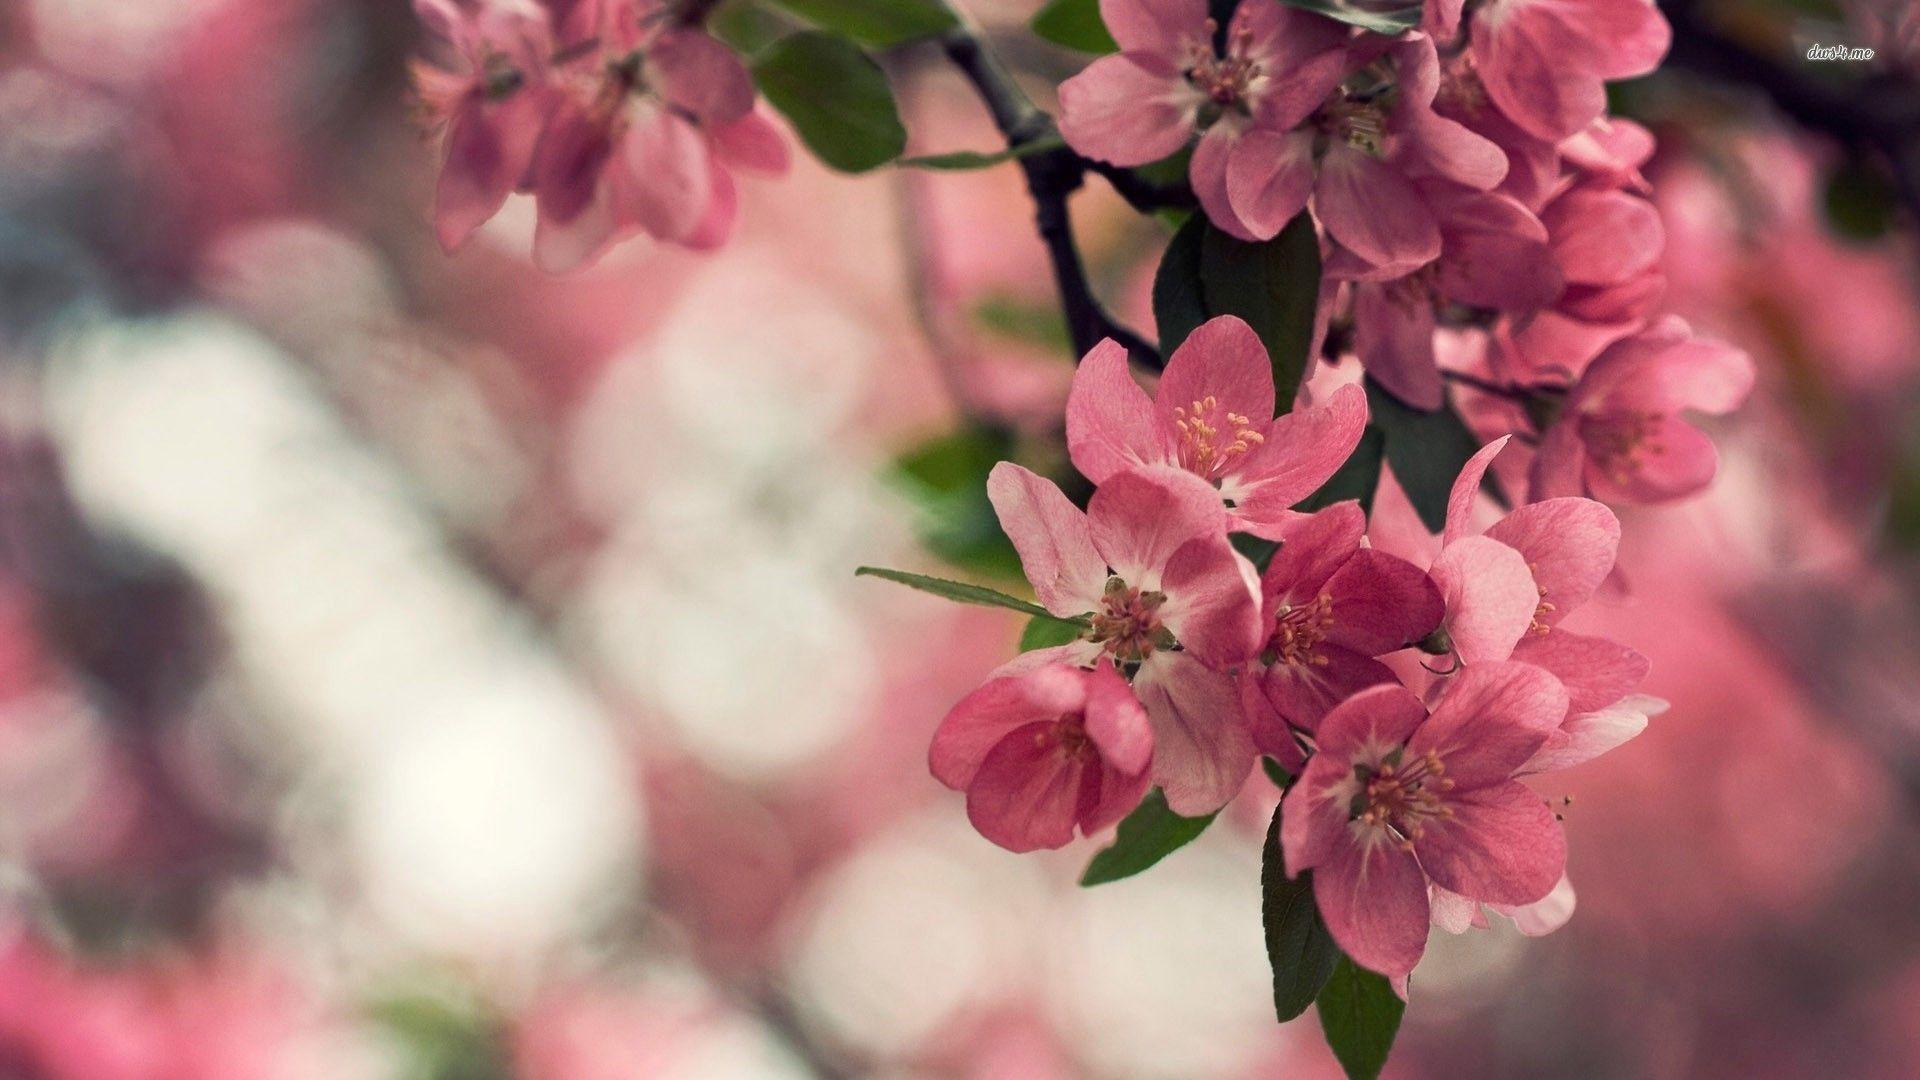 sakuraflowerscherryblossombranchbudspetalspinkwhitespring